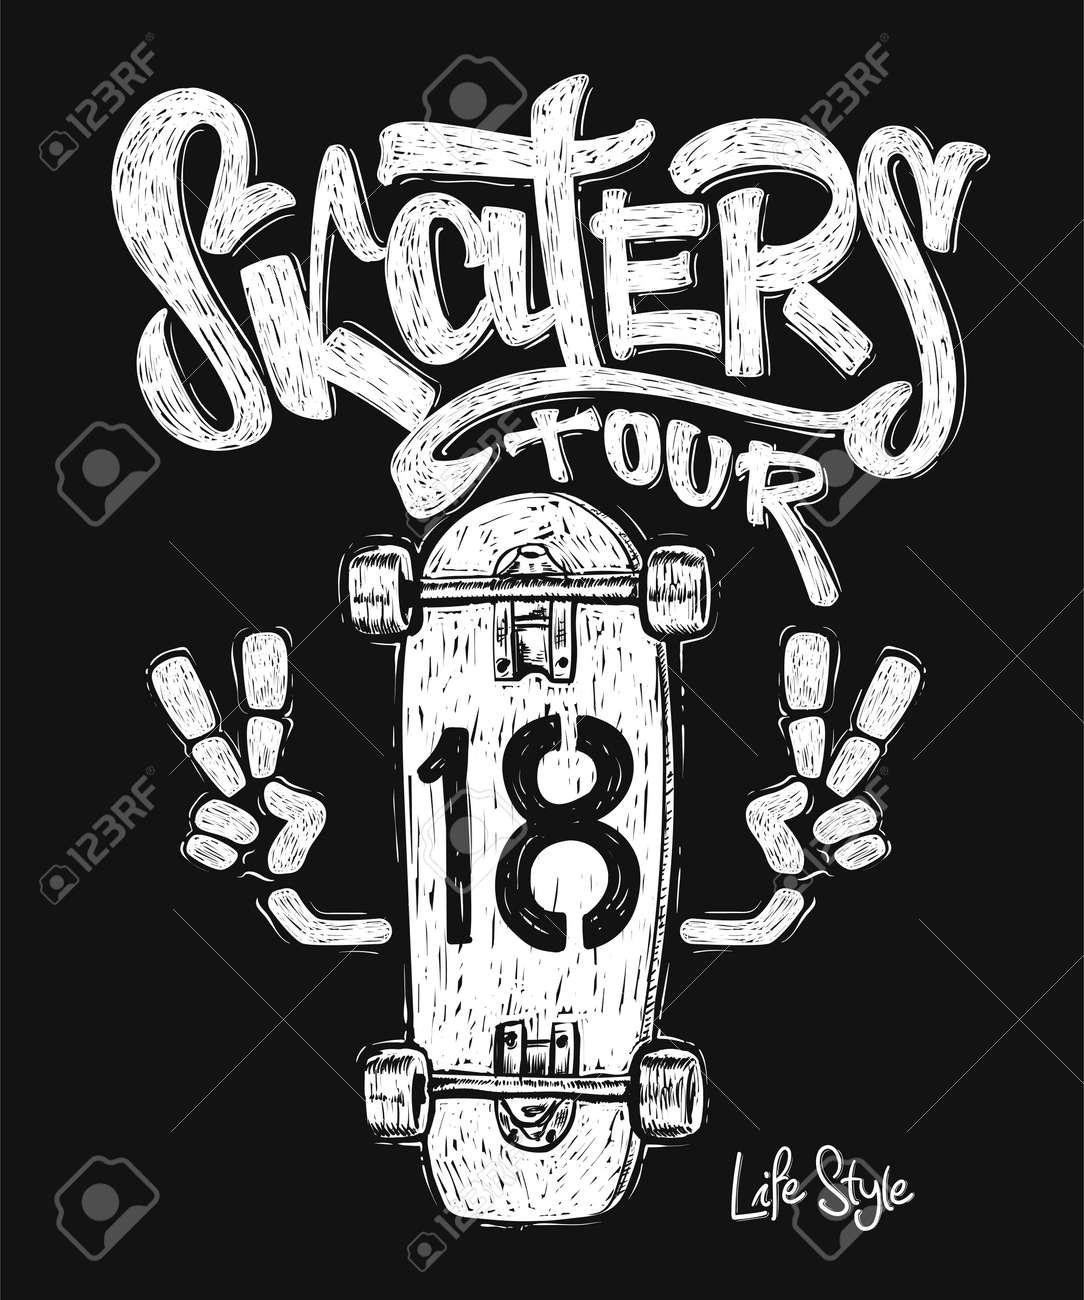 Skateboard Graphic T Shirt Design Royalty Free Cliparts Vectors